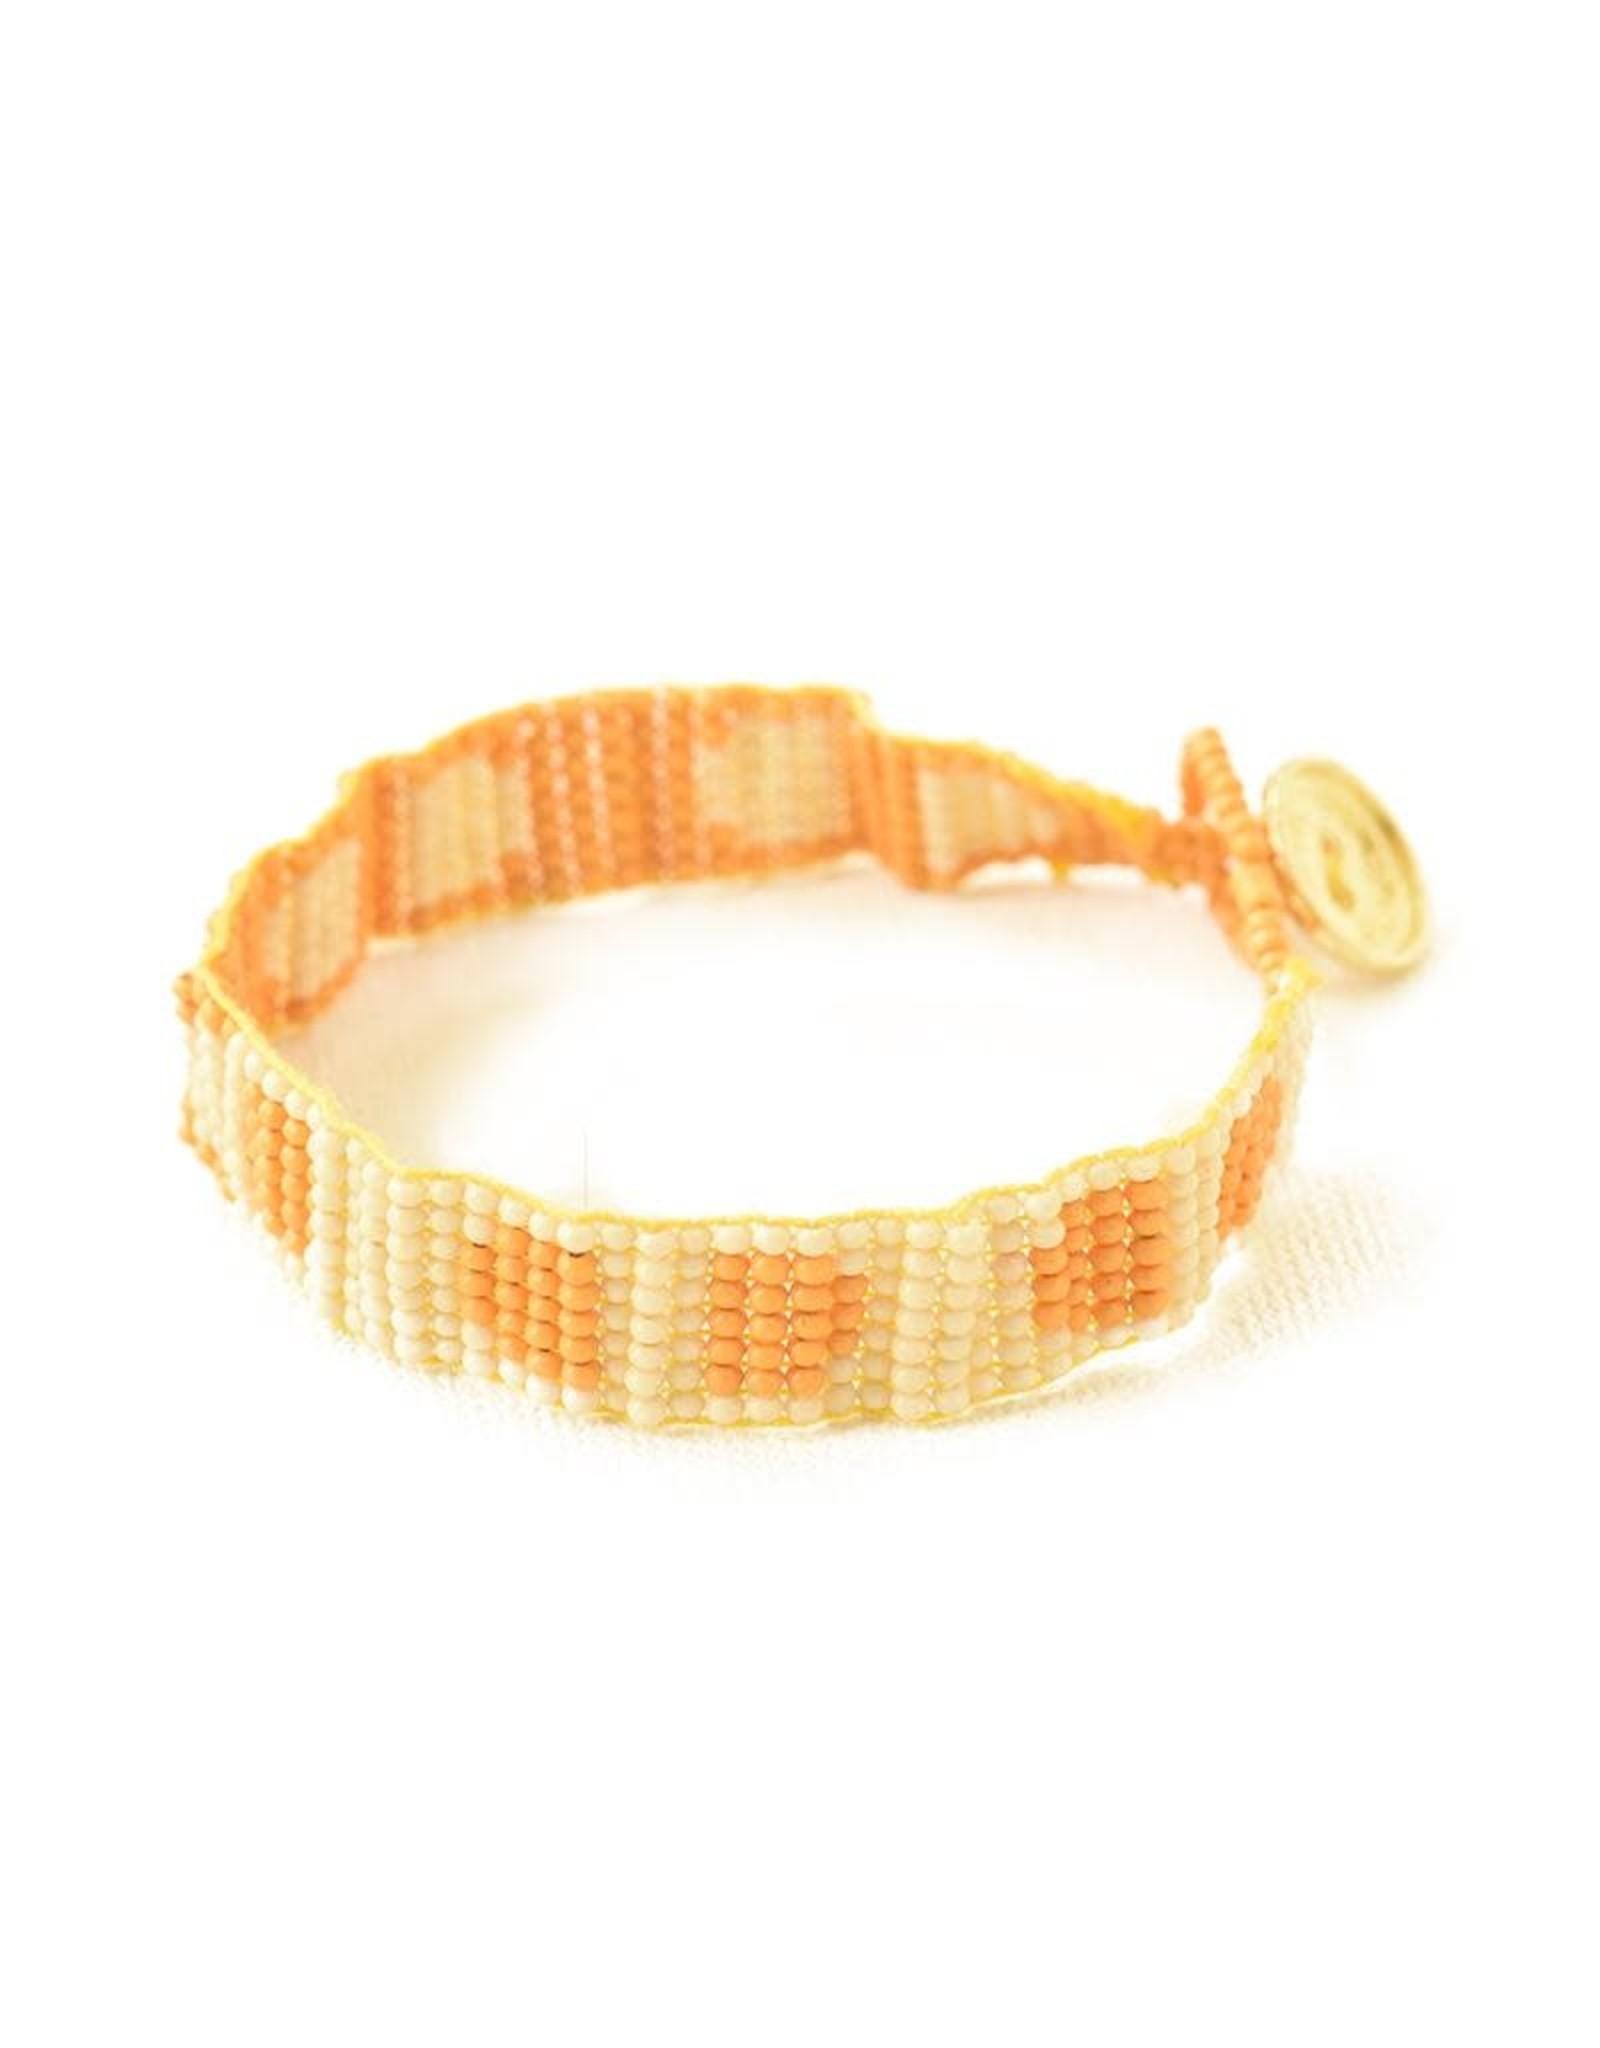 Ivory Seed Bracelet